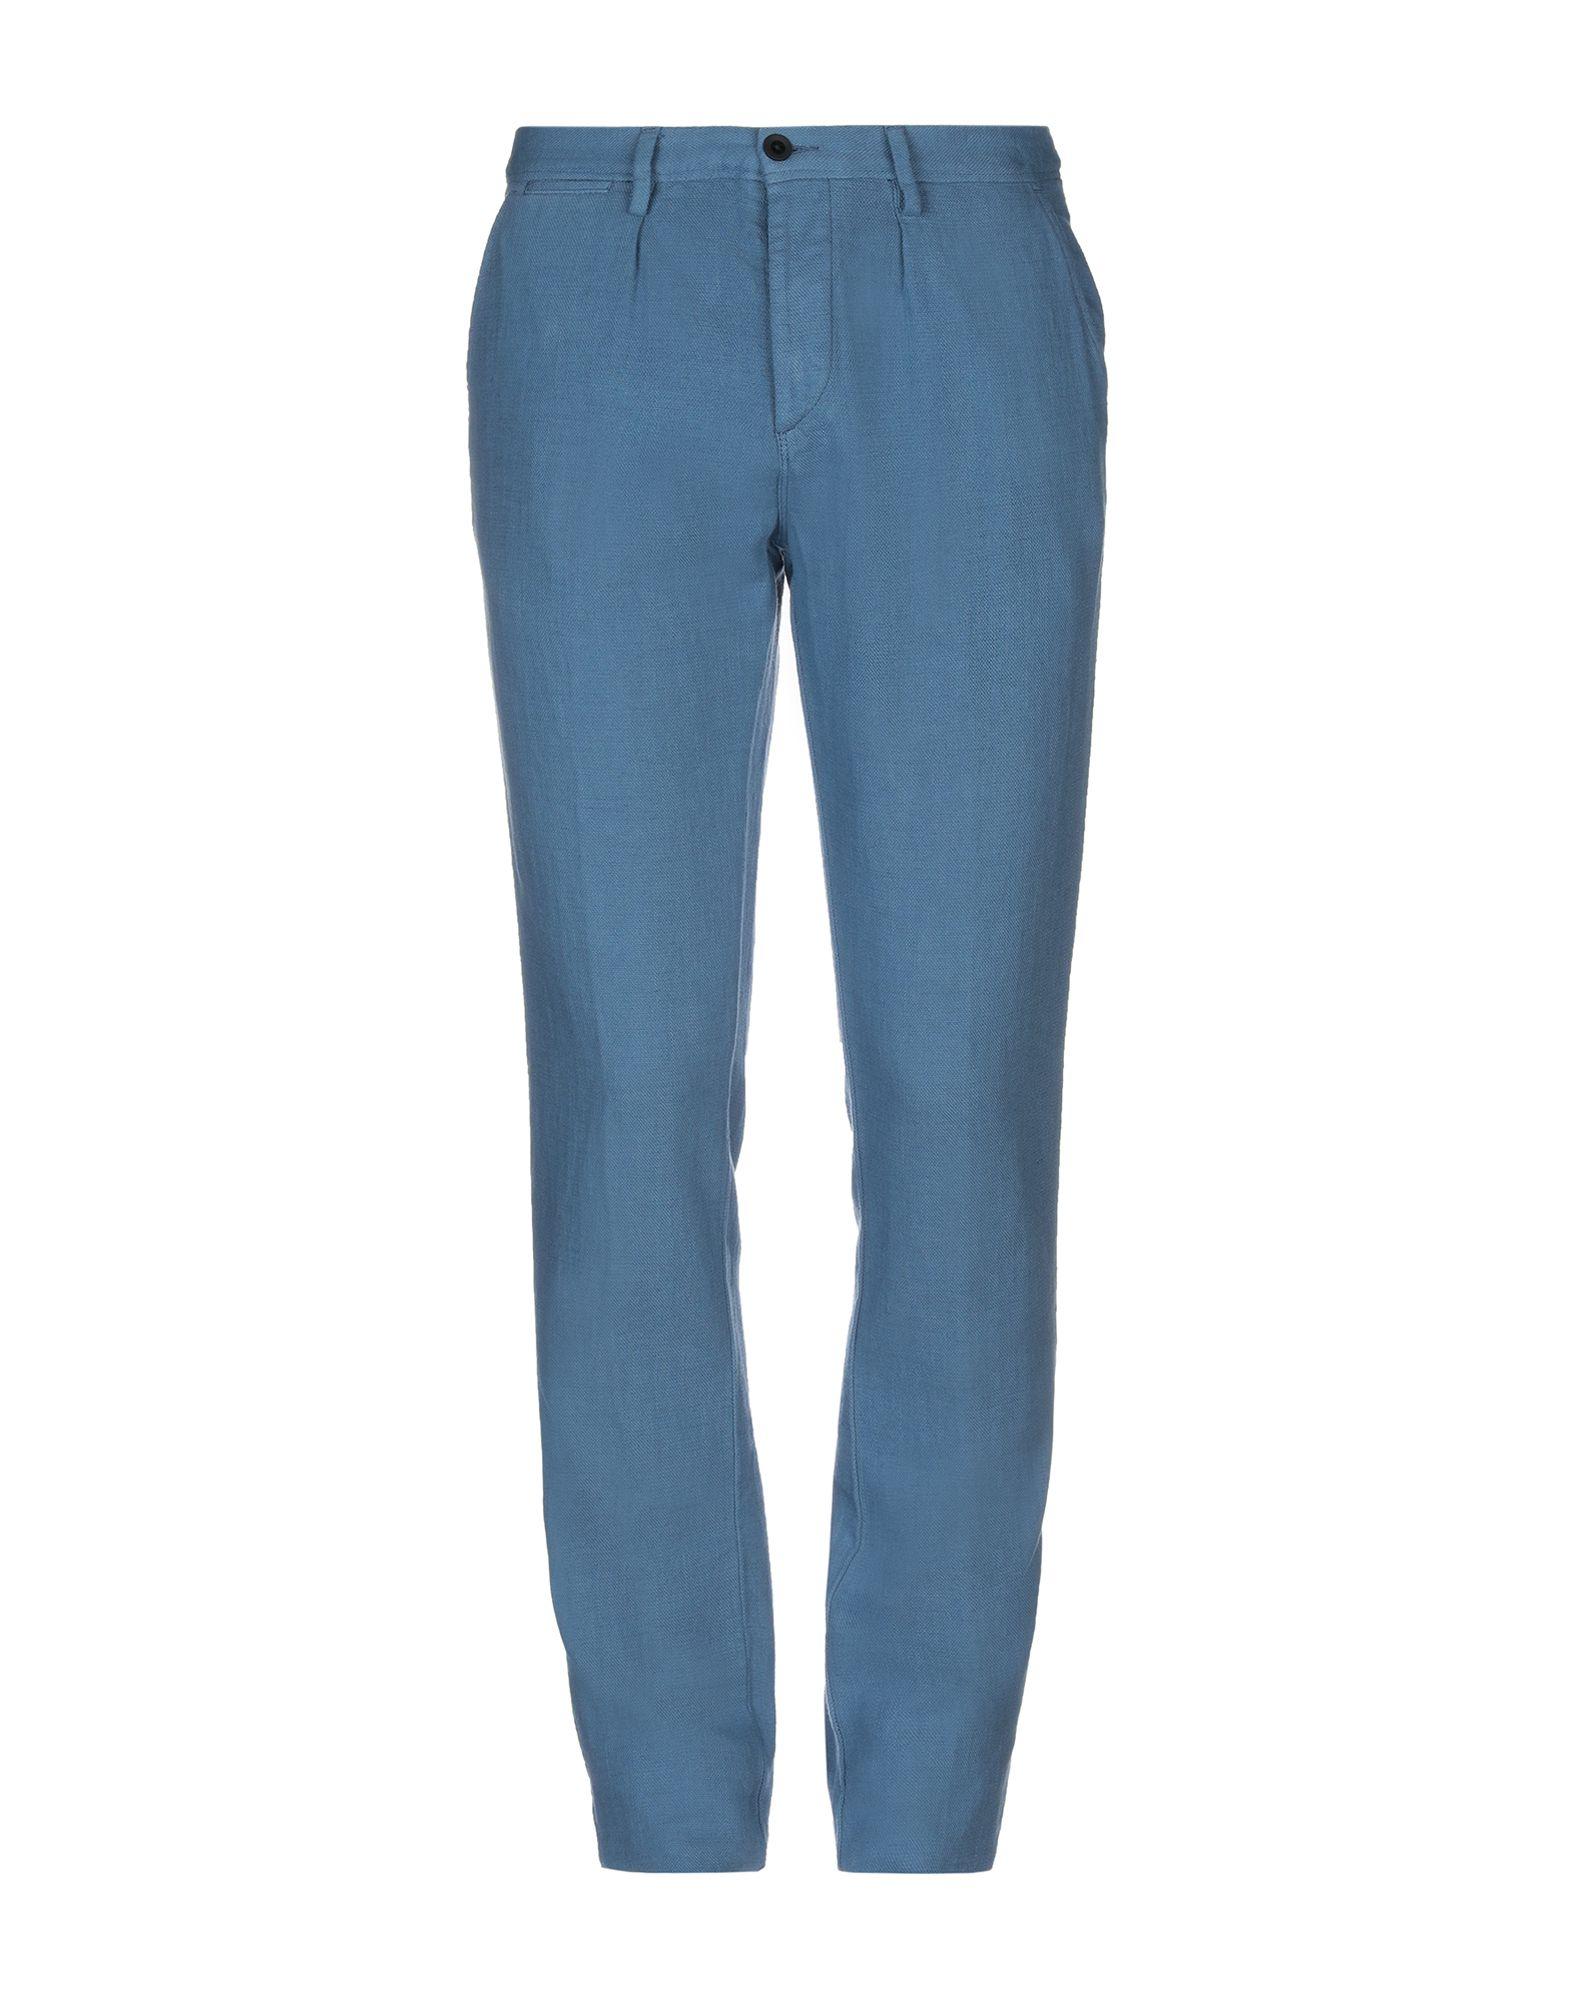 HENRI LLOYD Повседневные брюки henri lloyd свитер page 2